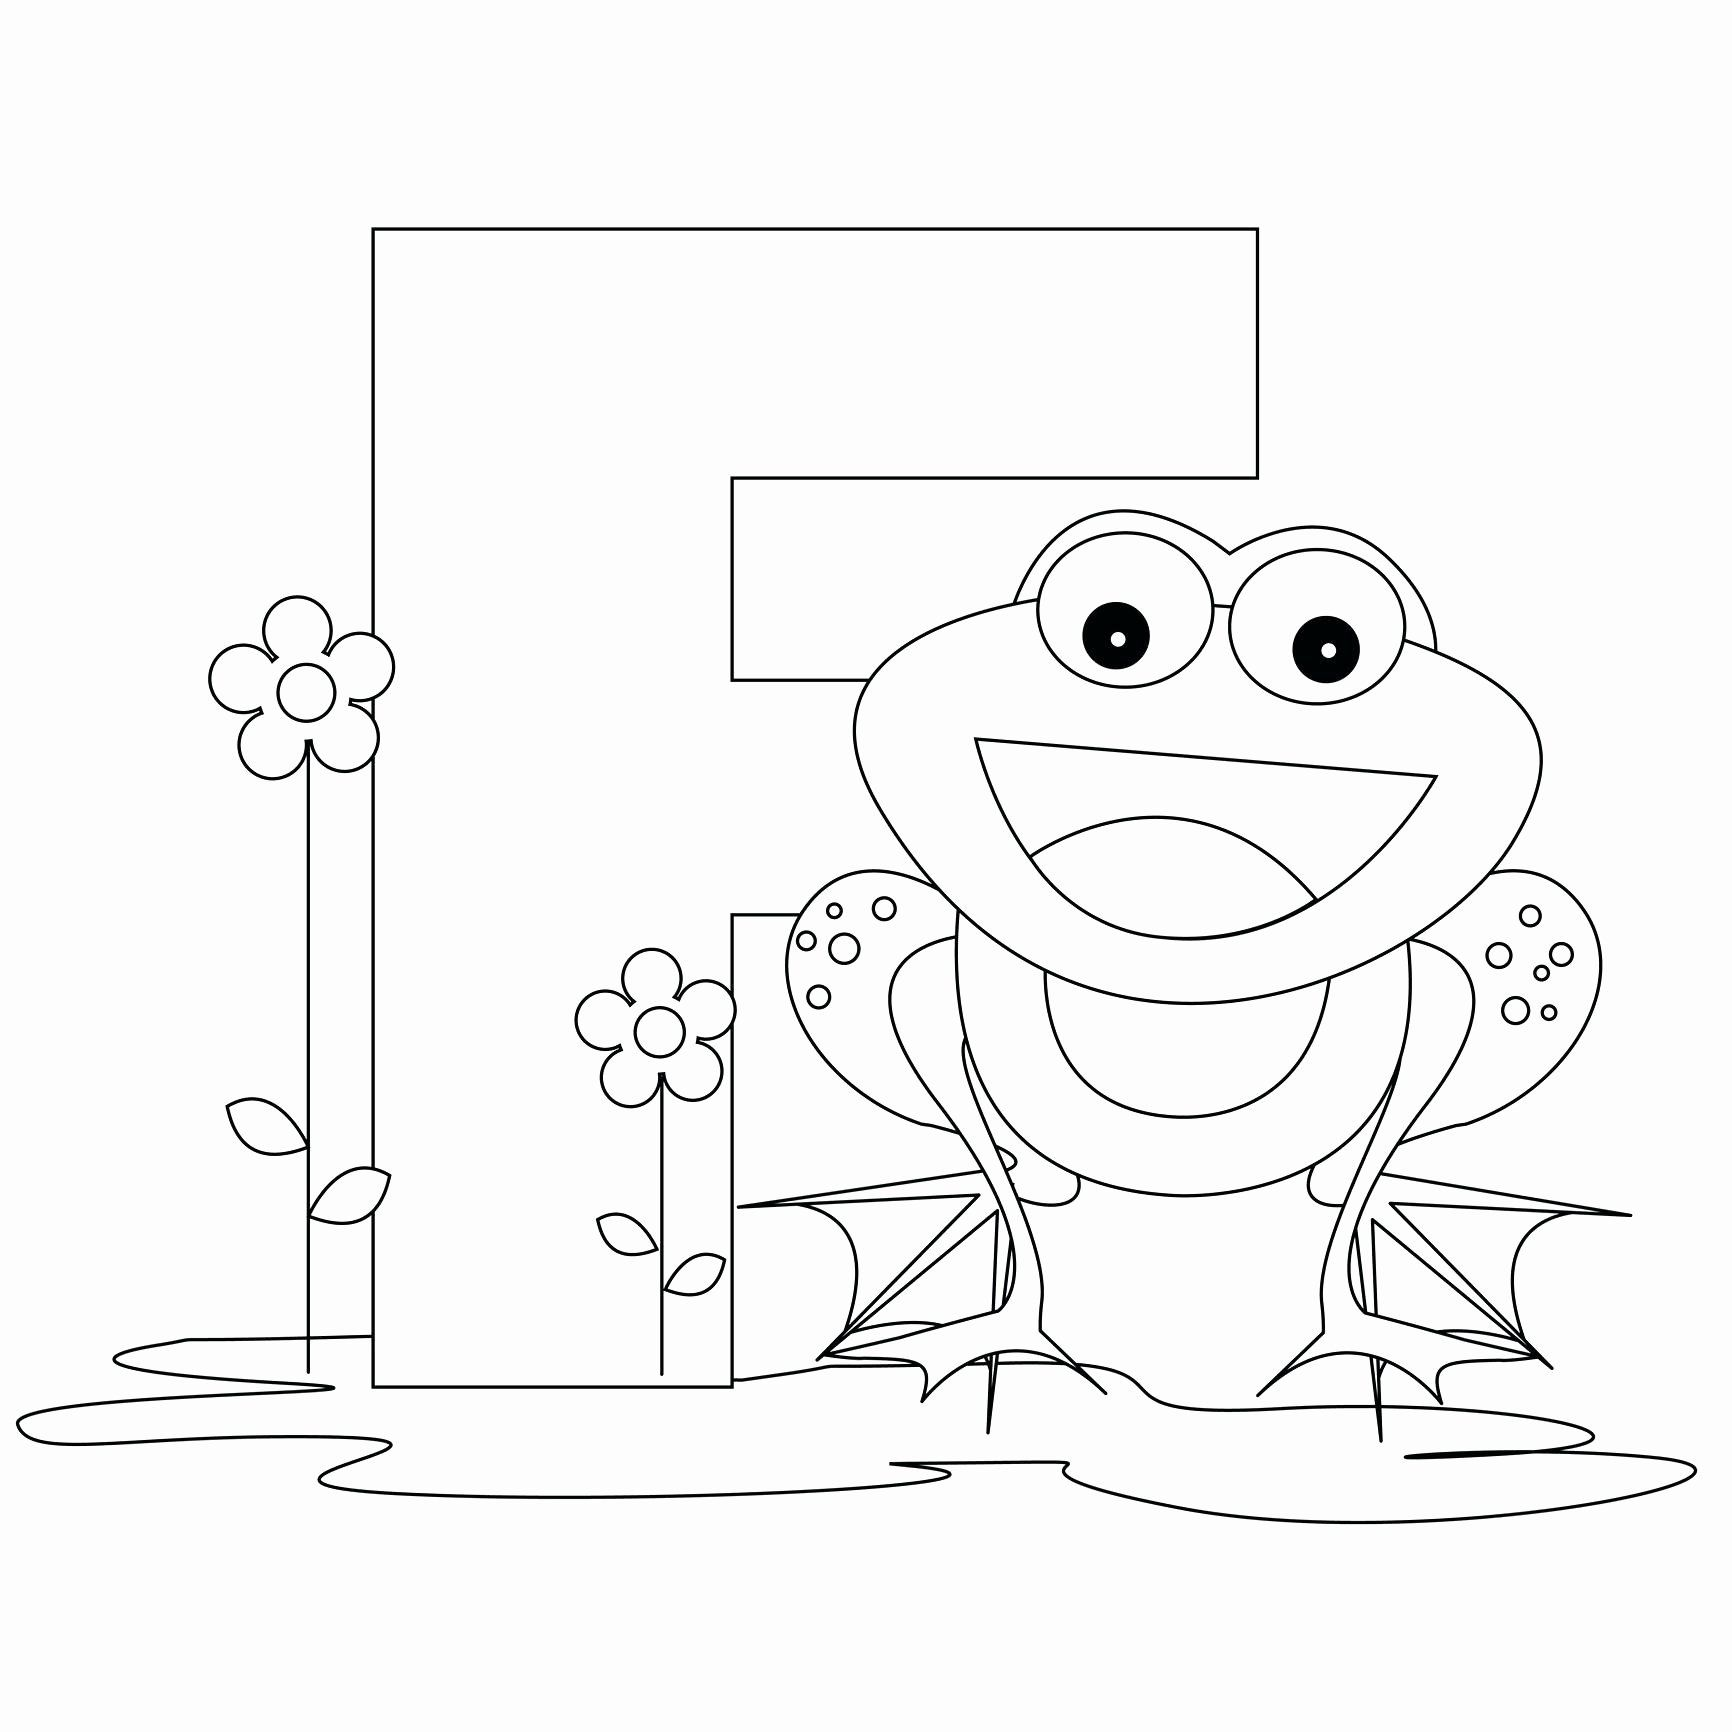 Alphabet Coloring Worksheets For Toddlers Best Of Preschool Alphabet Coloring Pages Membaca Belajar